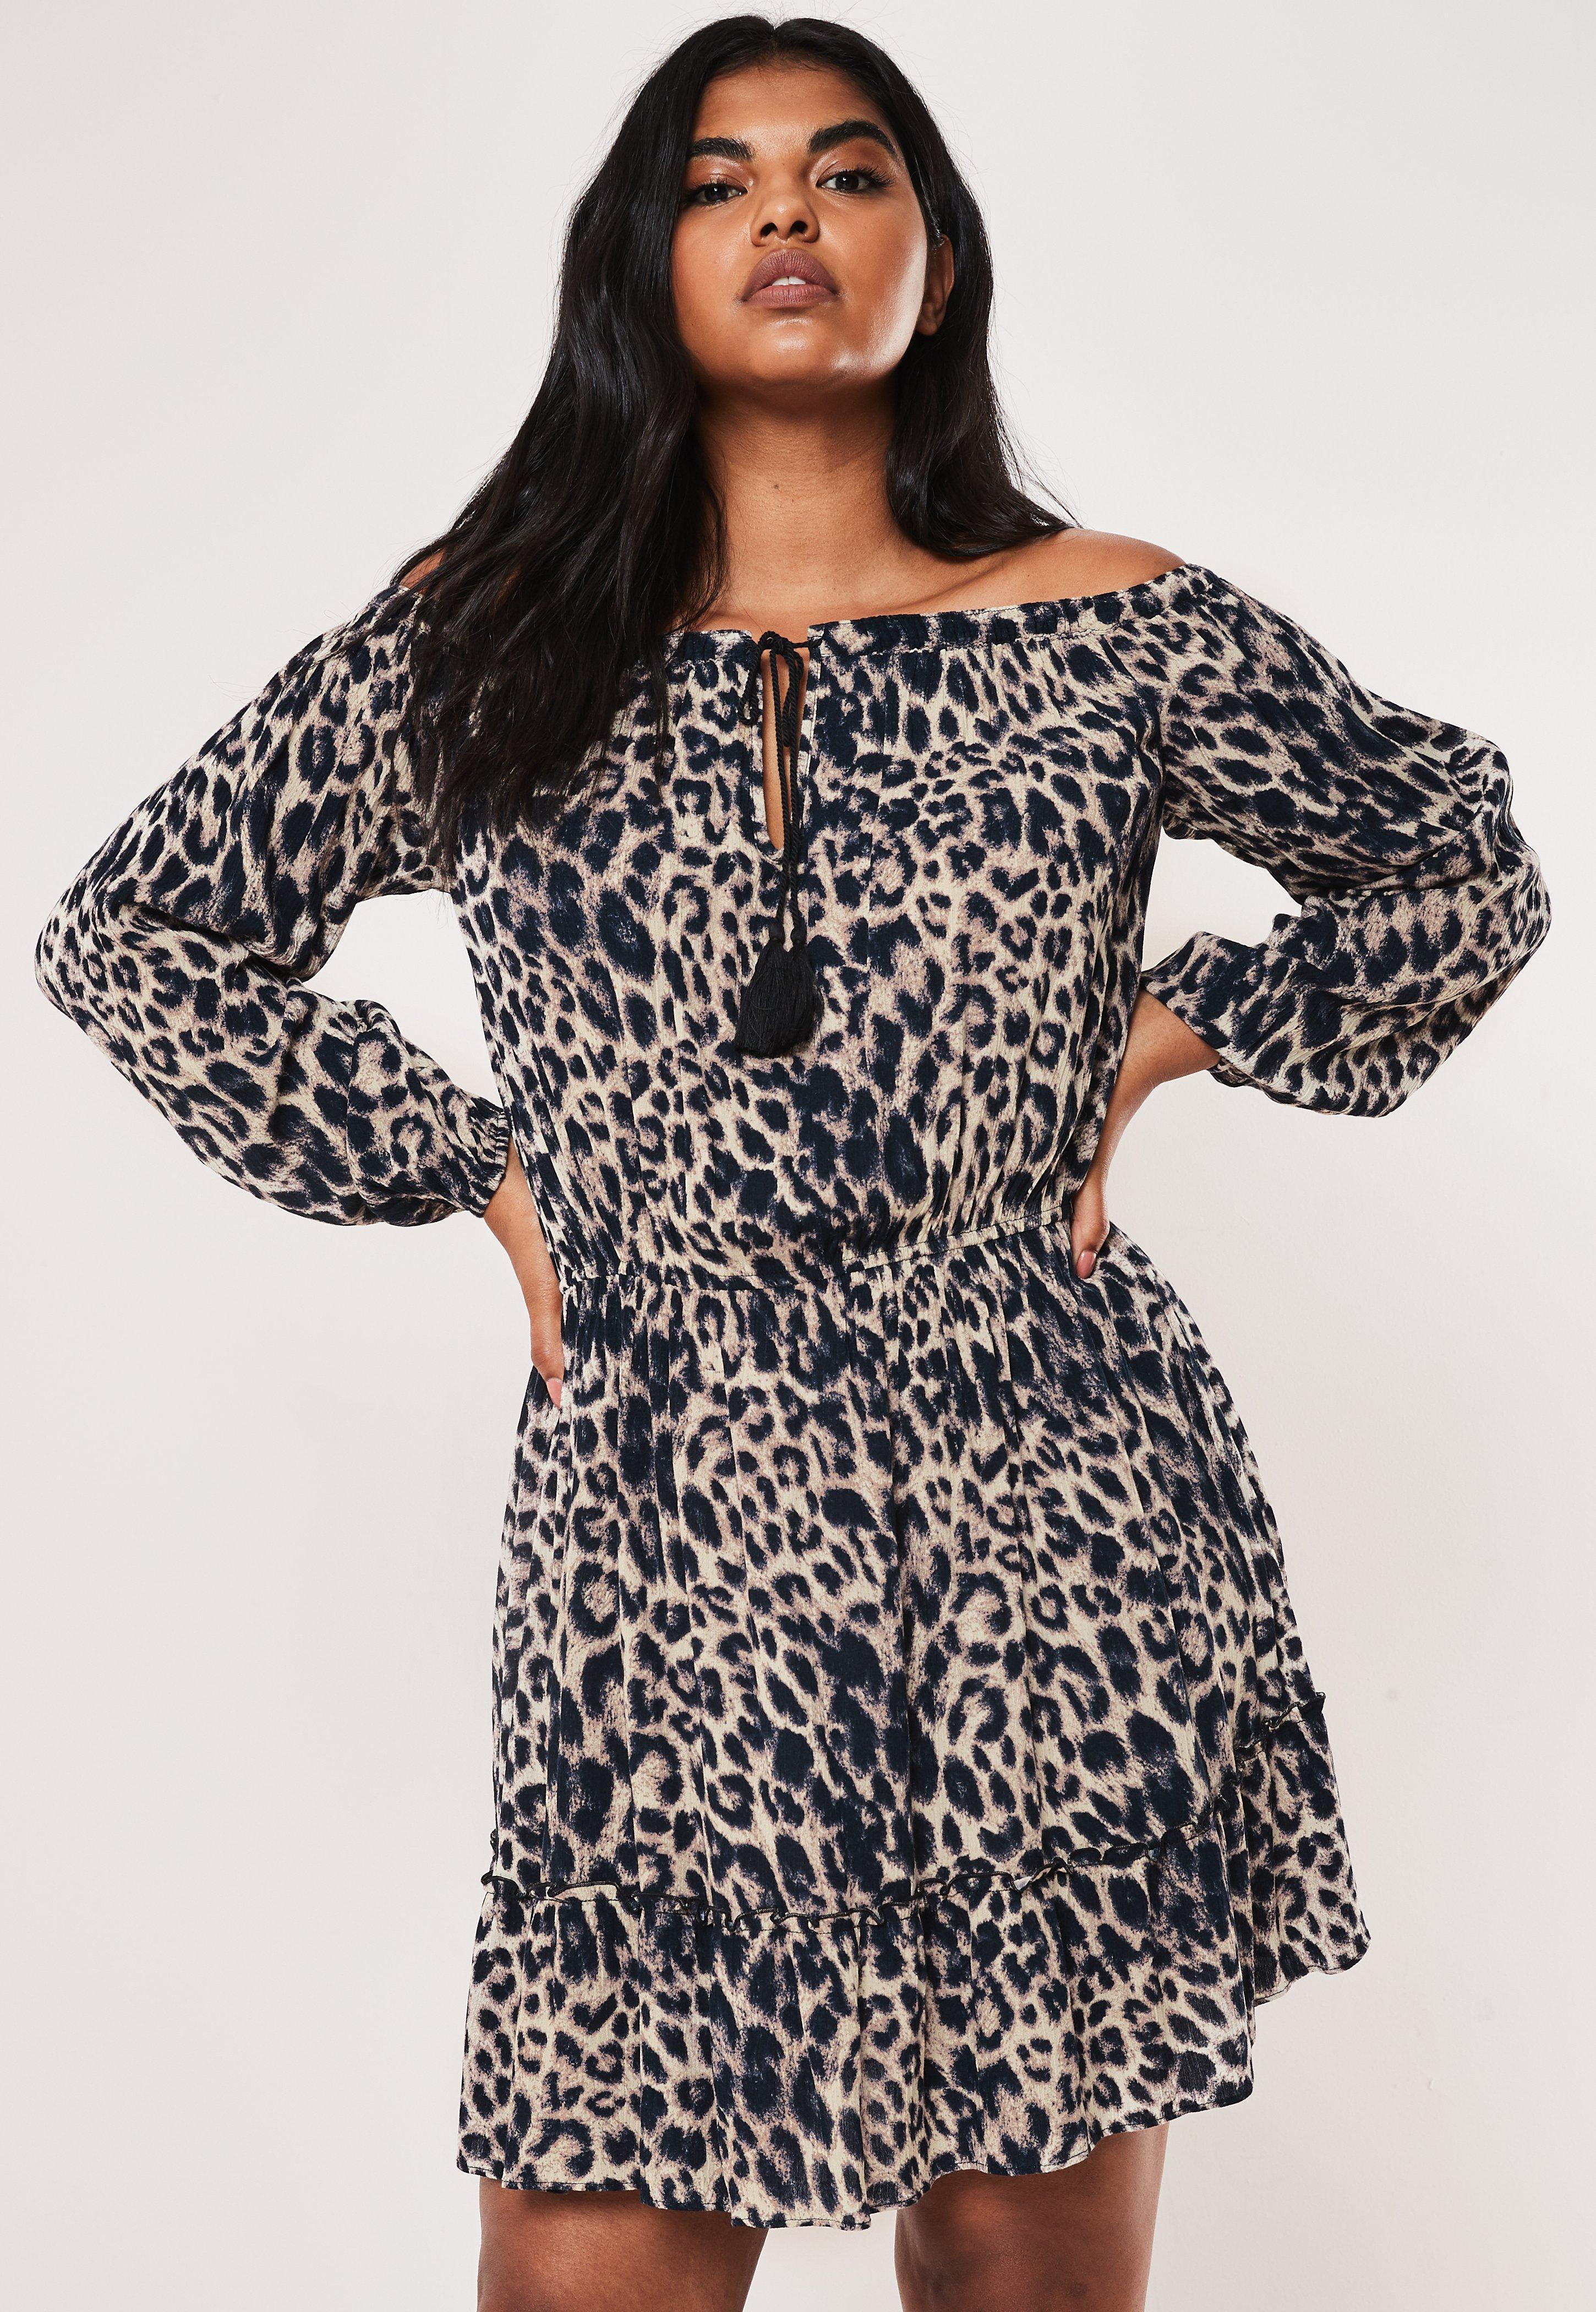 13372bc1e851 Leopard Print Dresses | Leopard Print Tops & Skirts – Missguided